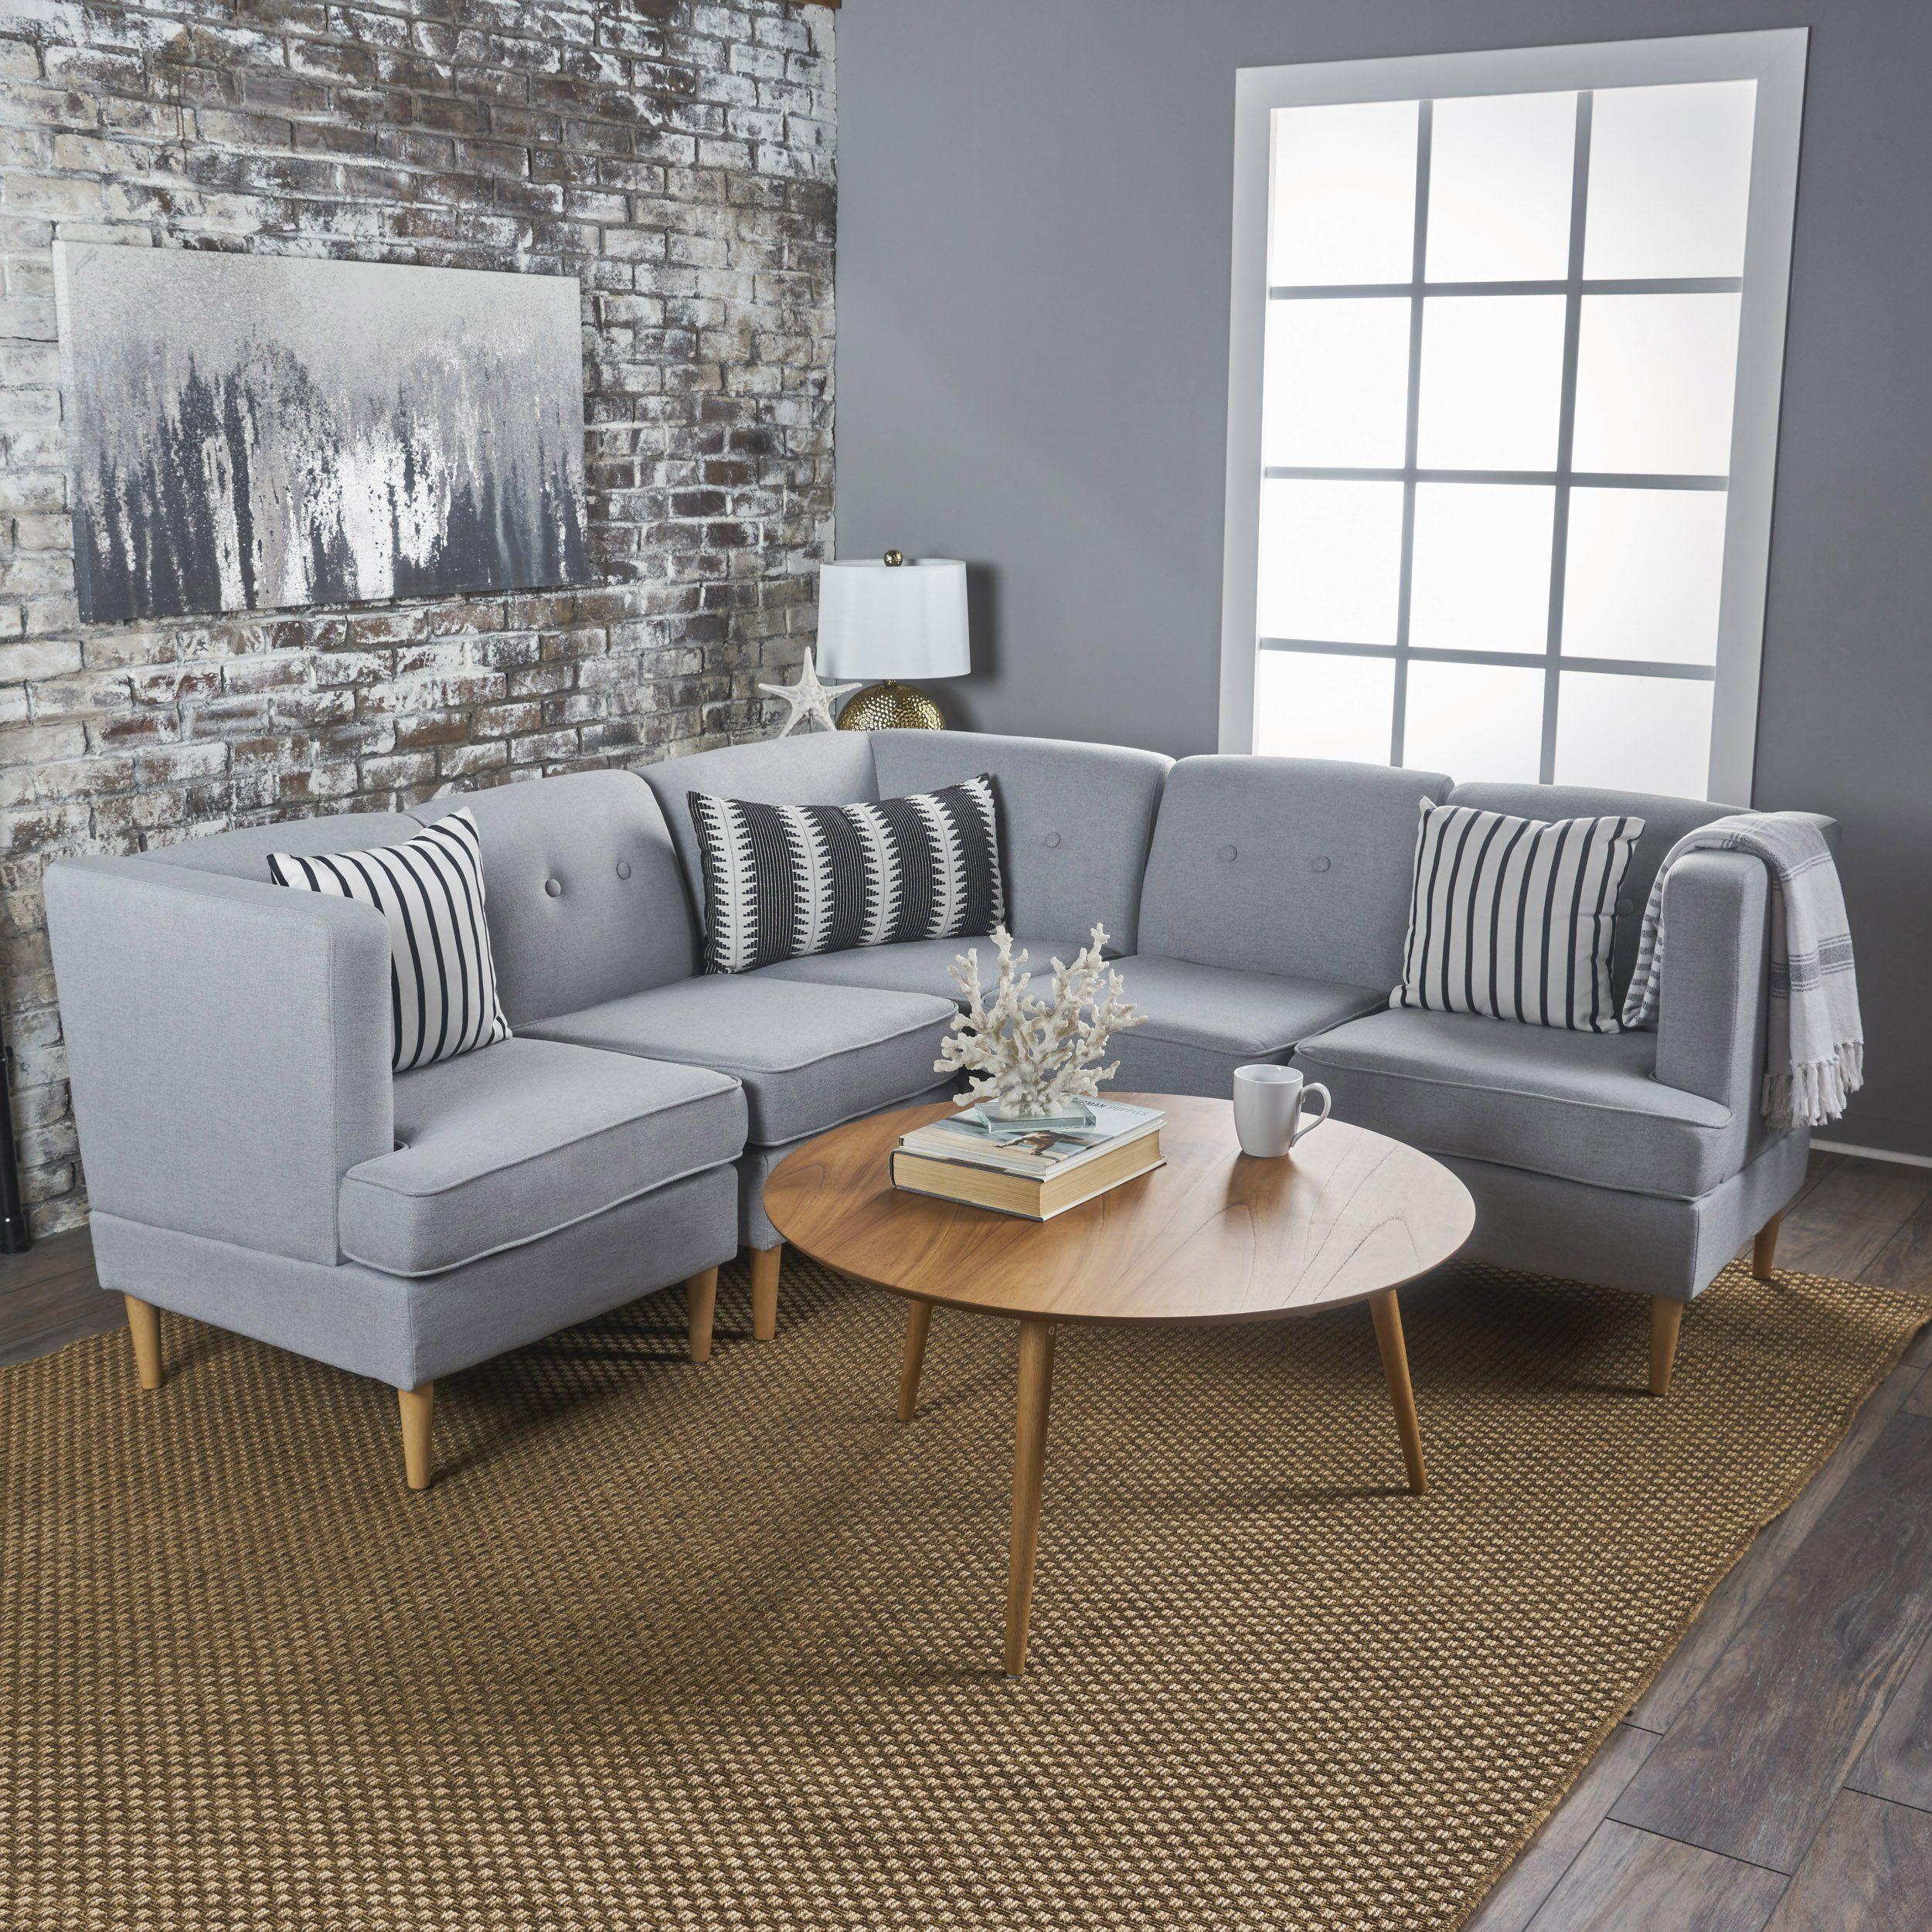 Milltown mid century modern fabric piece sectional sofa set